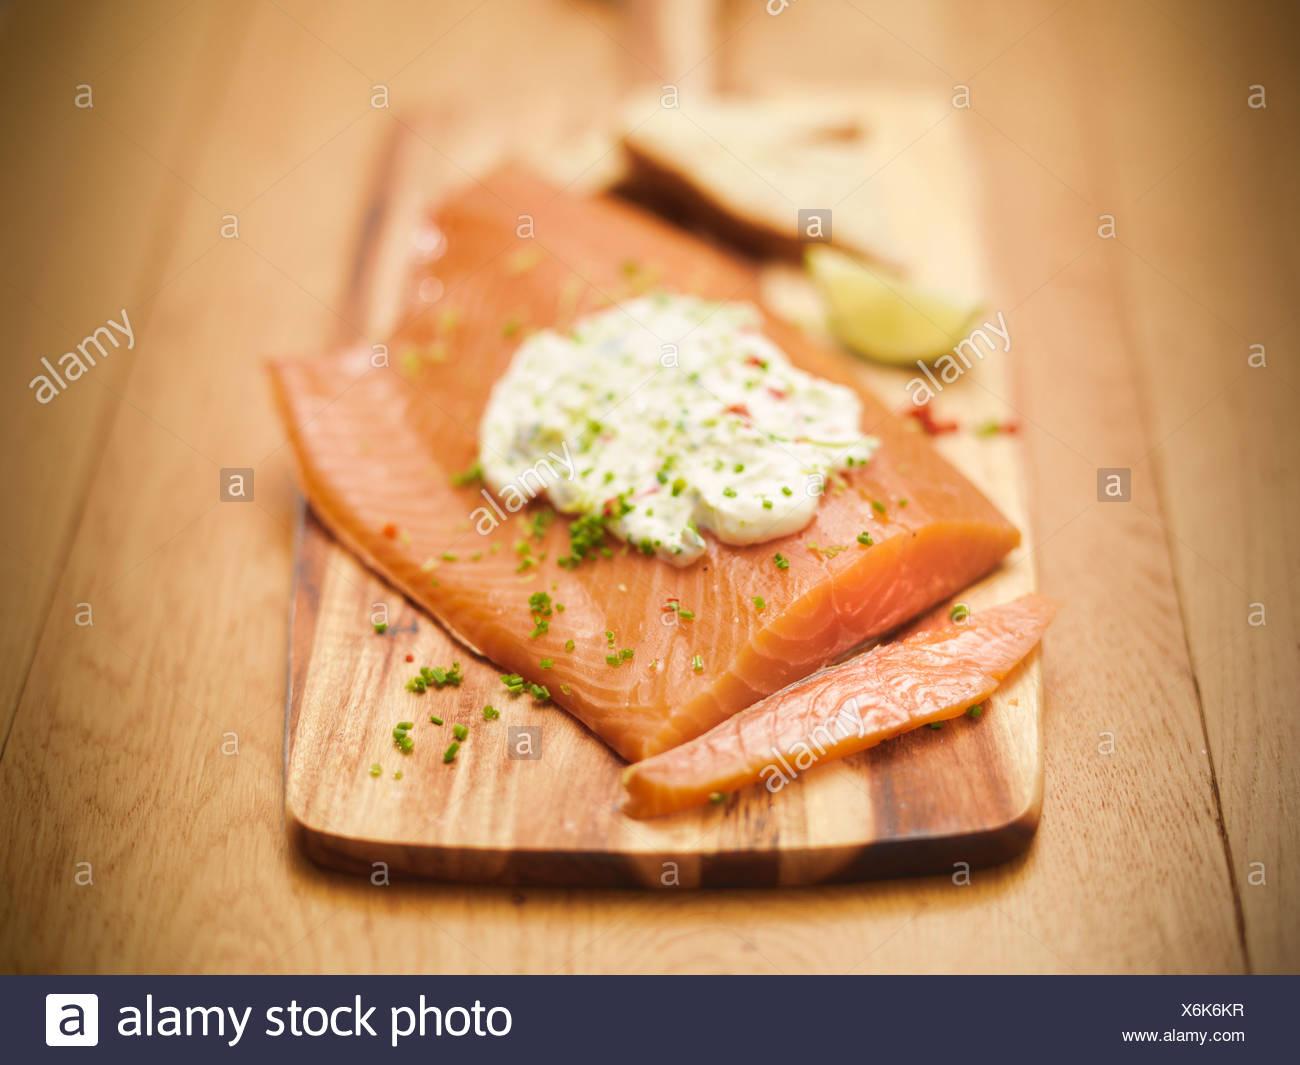 Assiette de saumon avec sauce tartare Photo Stock